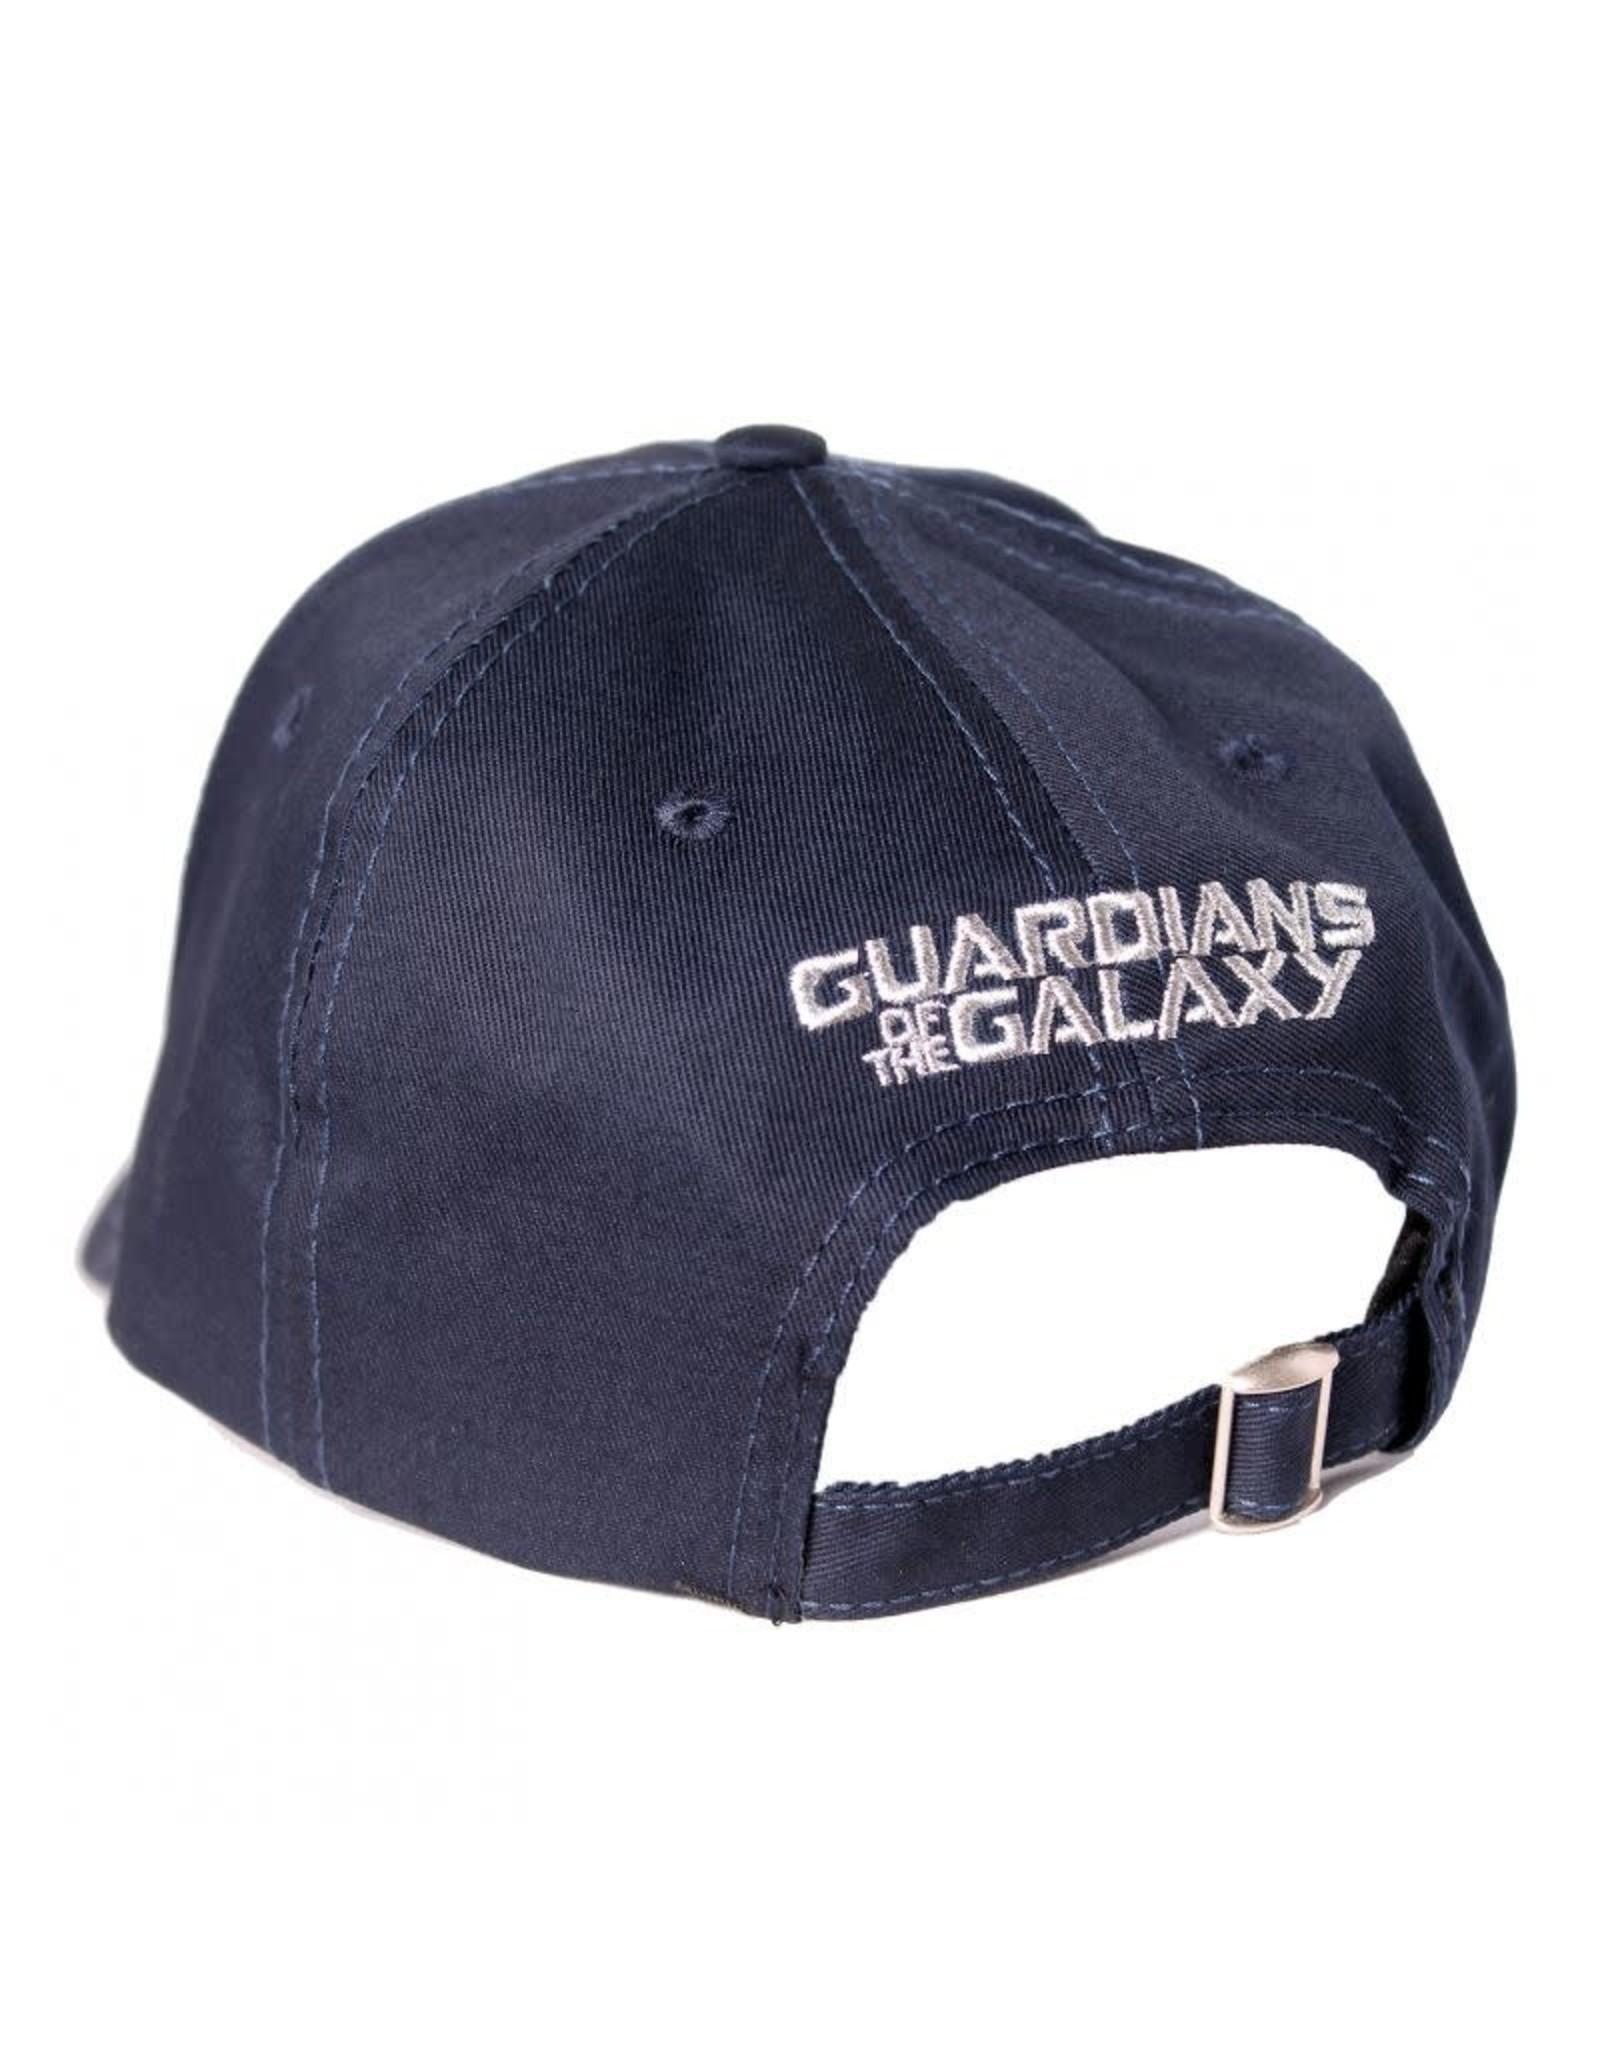 GUARDIANS OF THE GALAXY 2 - Logo Cap